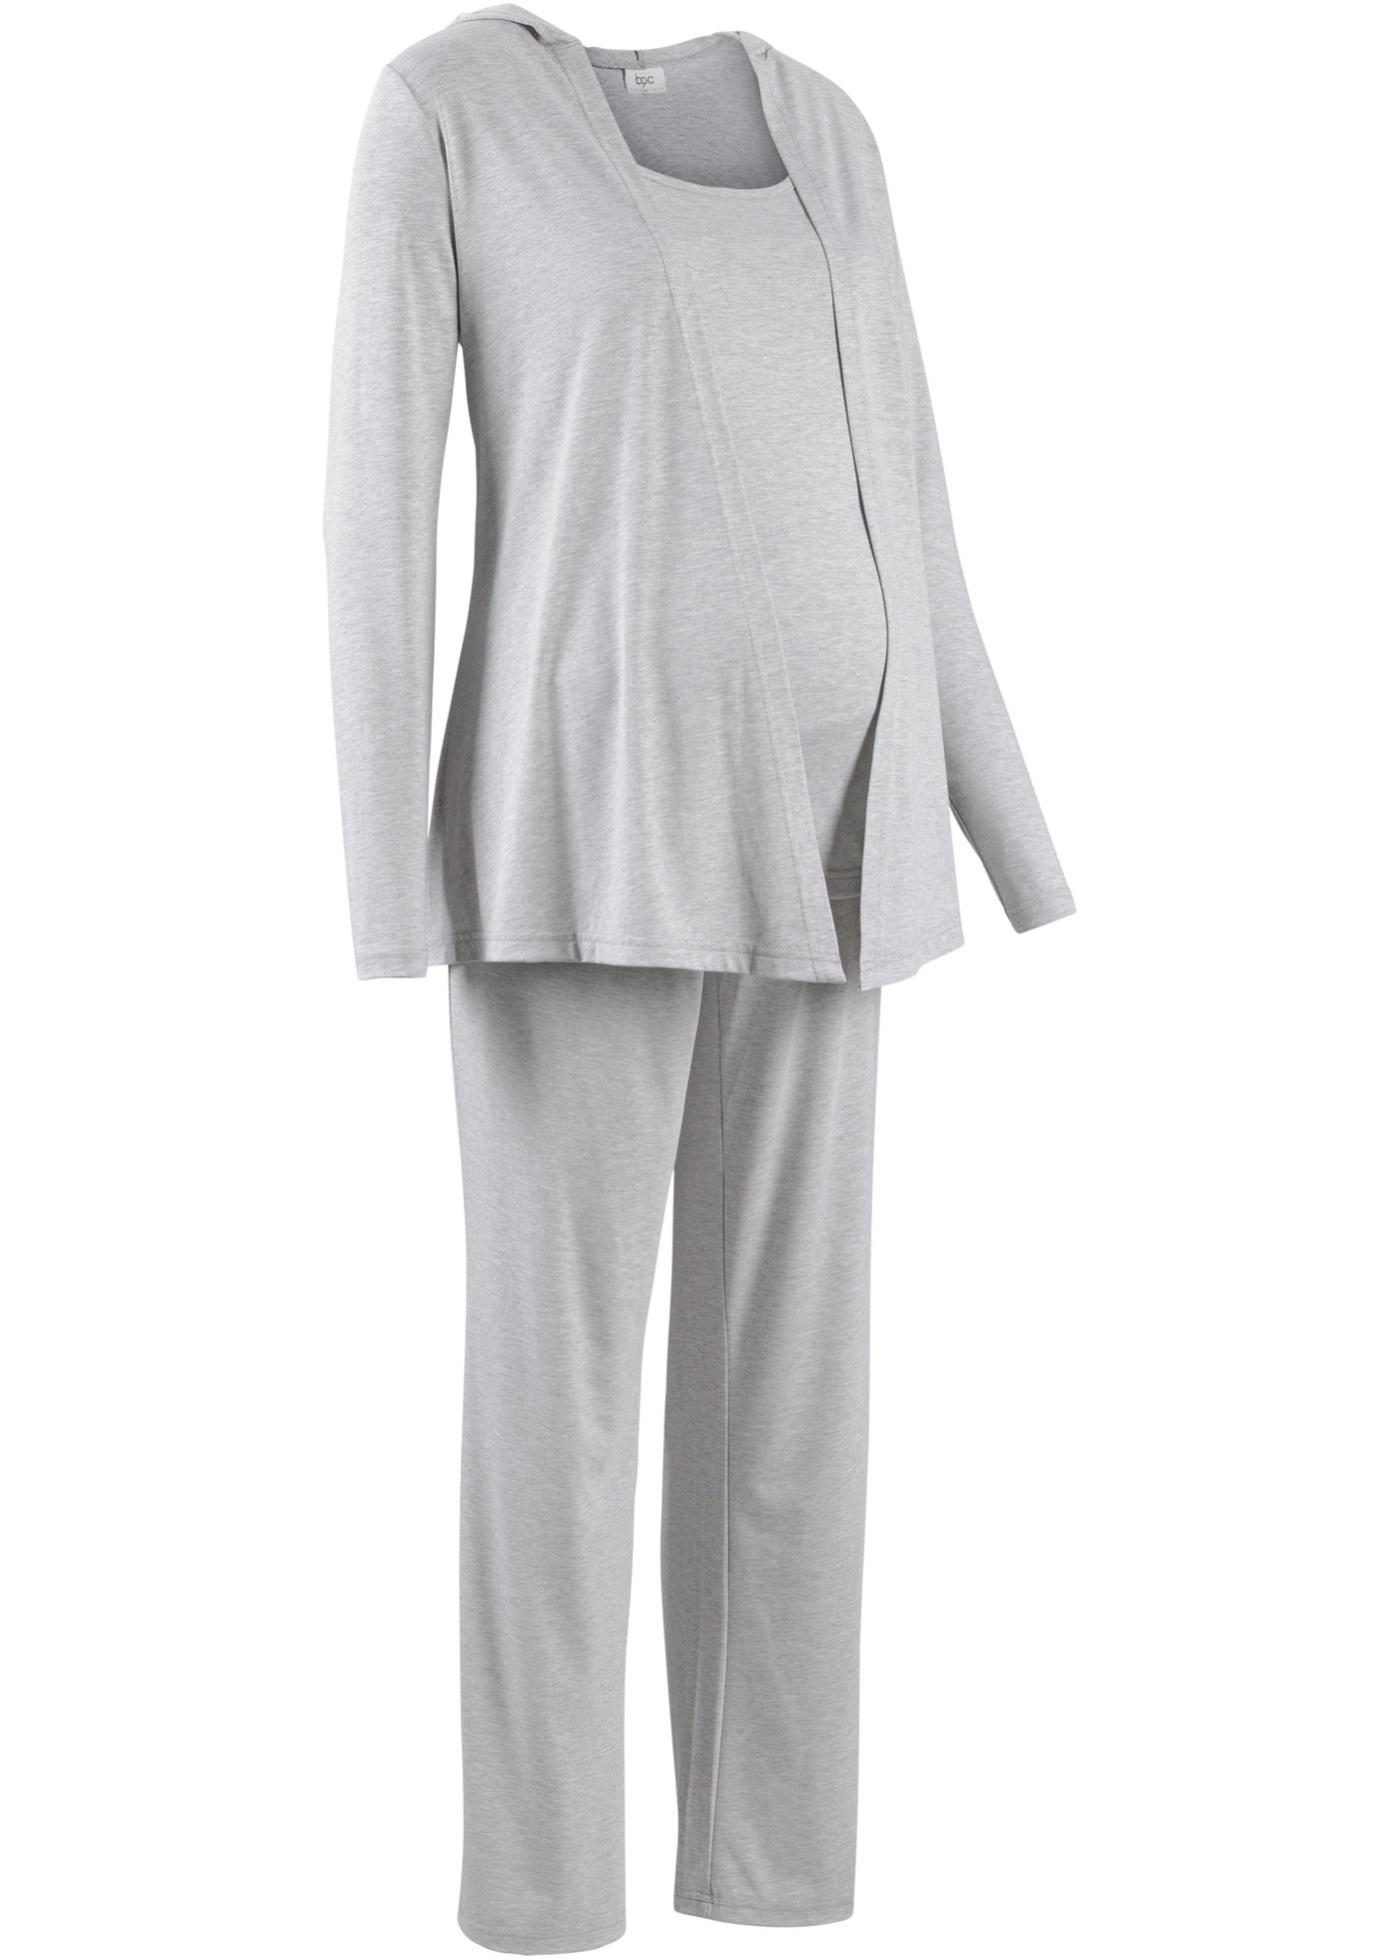 pantalon fluide extra large jusqu 50 pureshopping. Black Bedroom Furniture Sets. Home Design Ideas